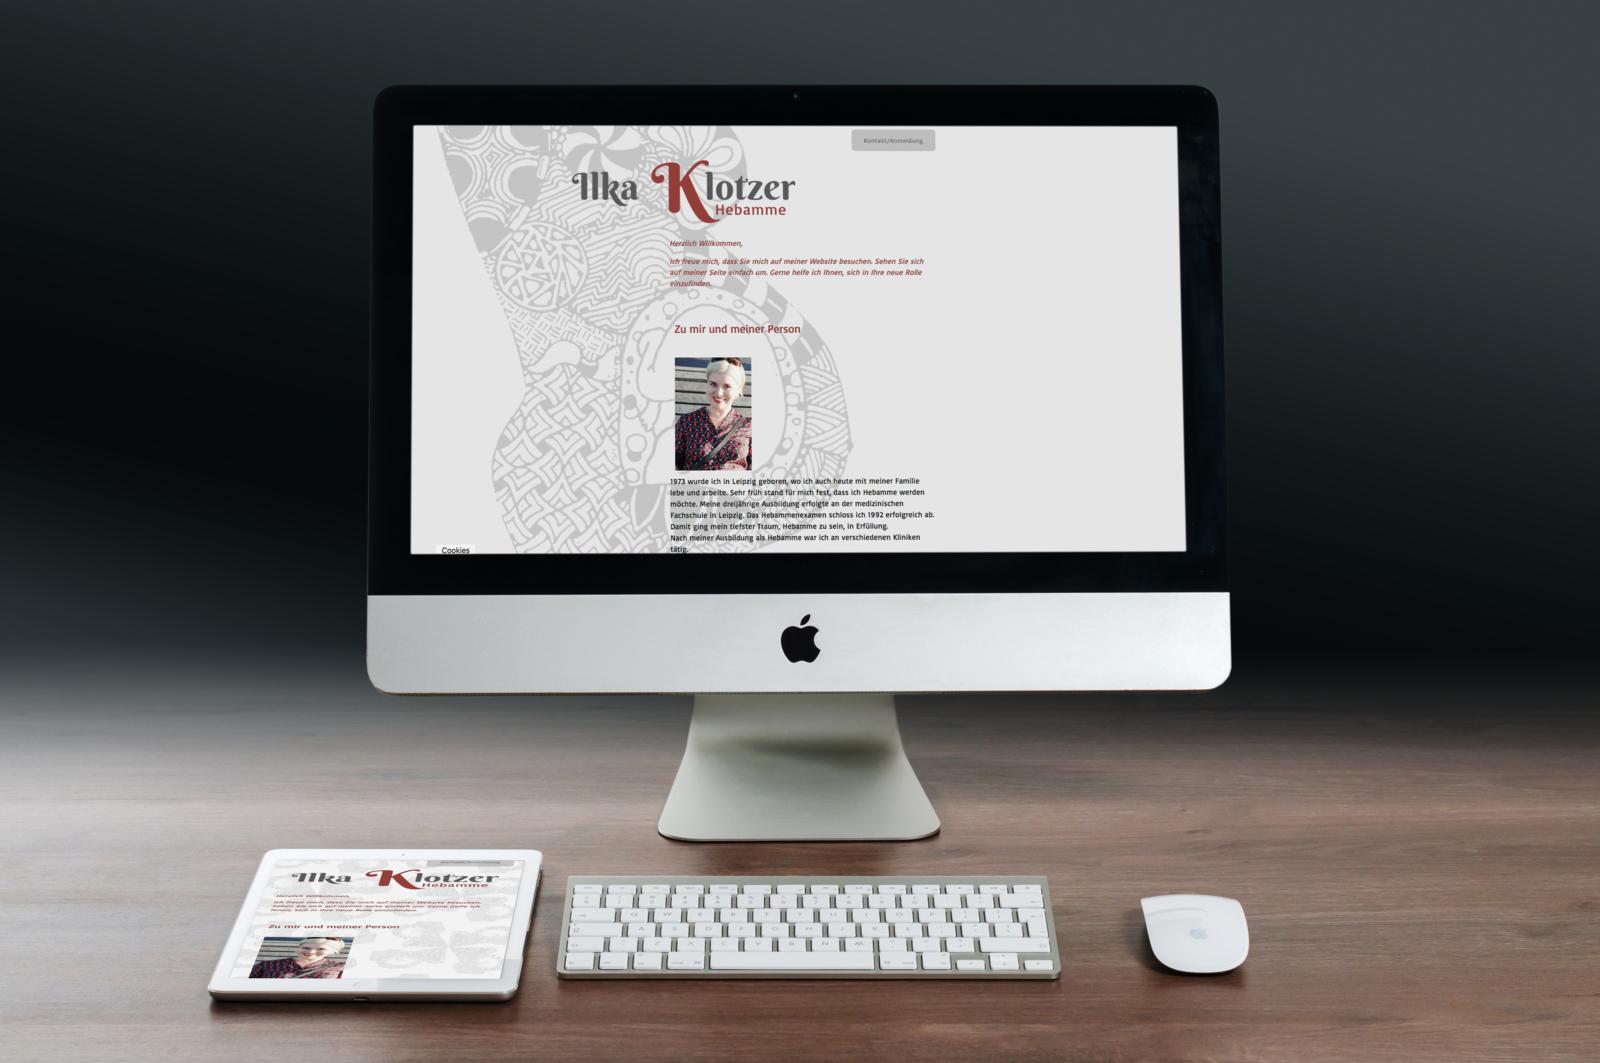 Webdesign, Hebamme Leipzig, Ilka Klotzer